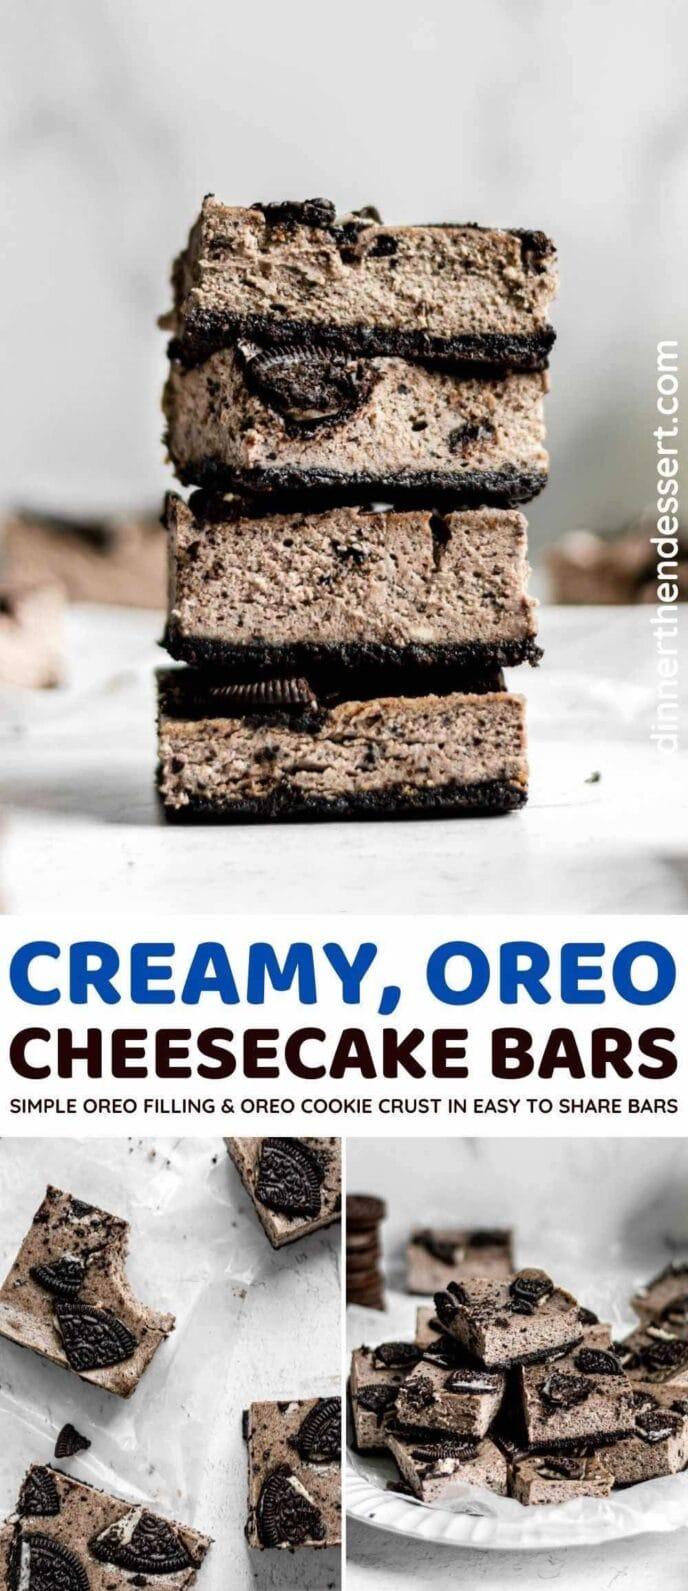 Creamy, Oreo Cheesecake Bars